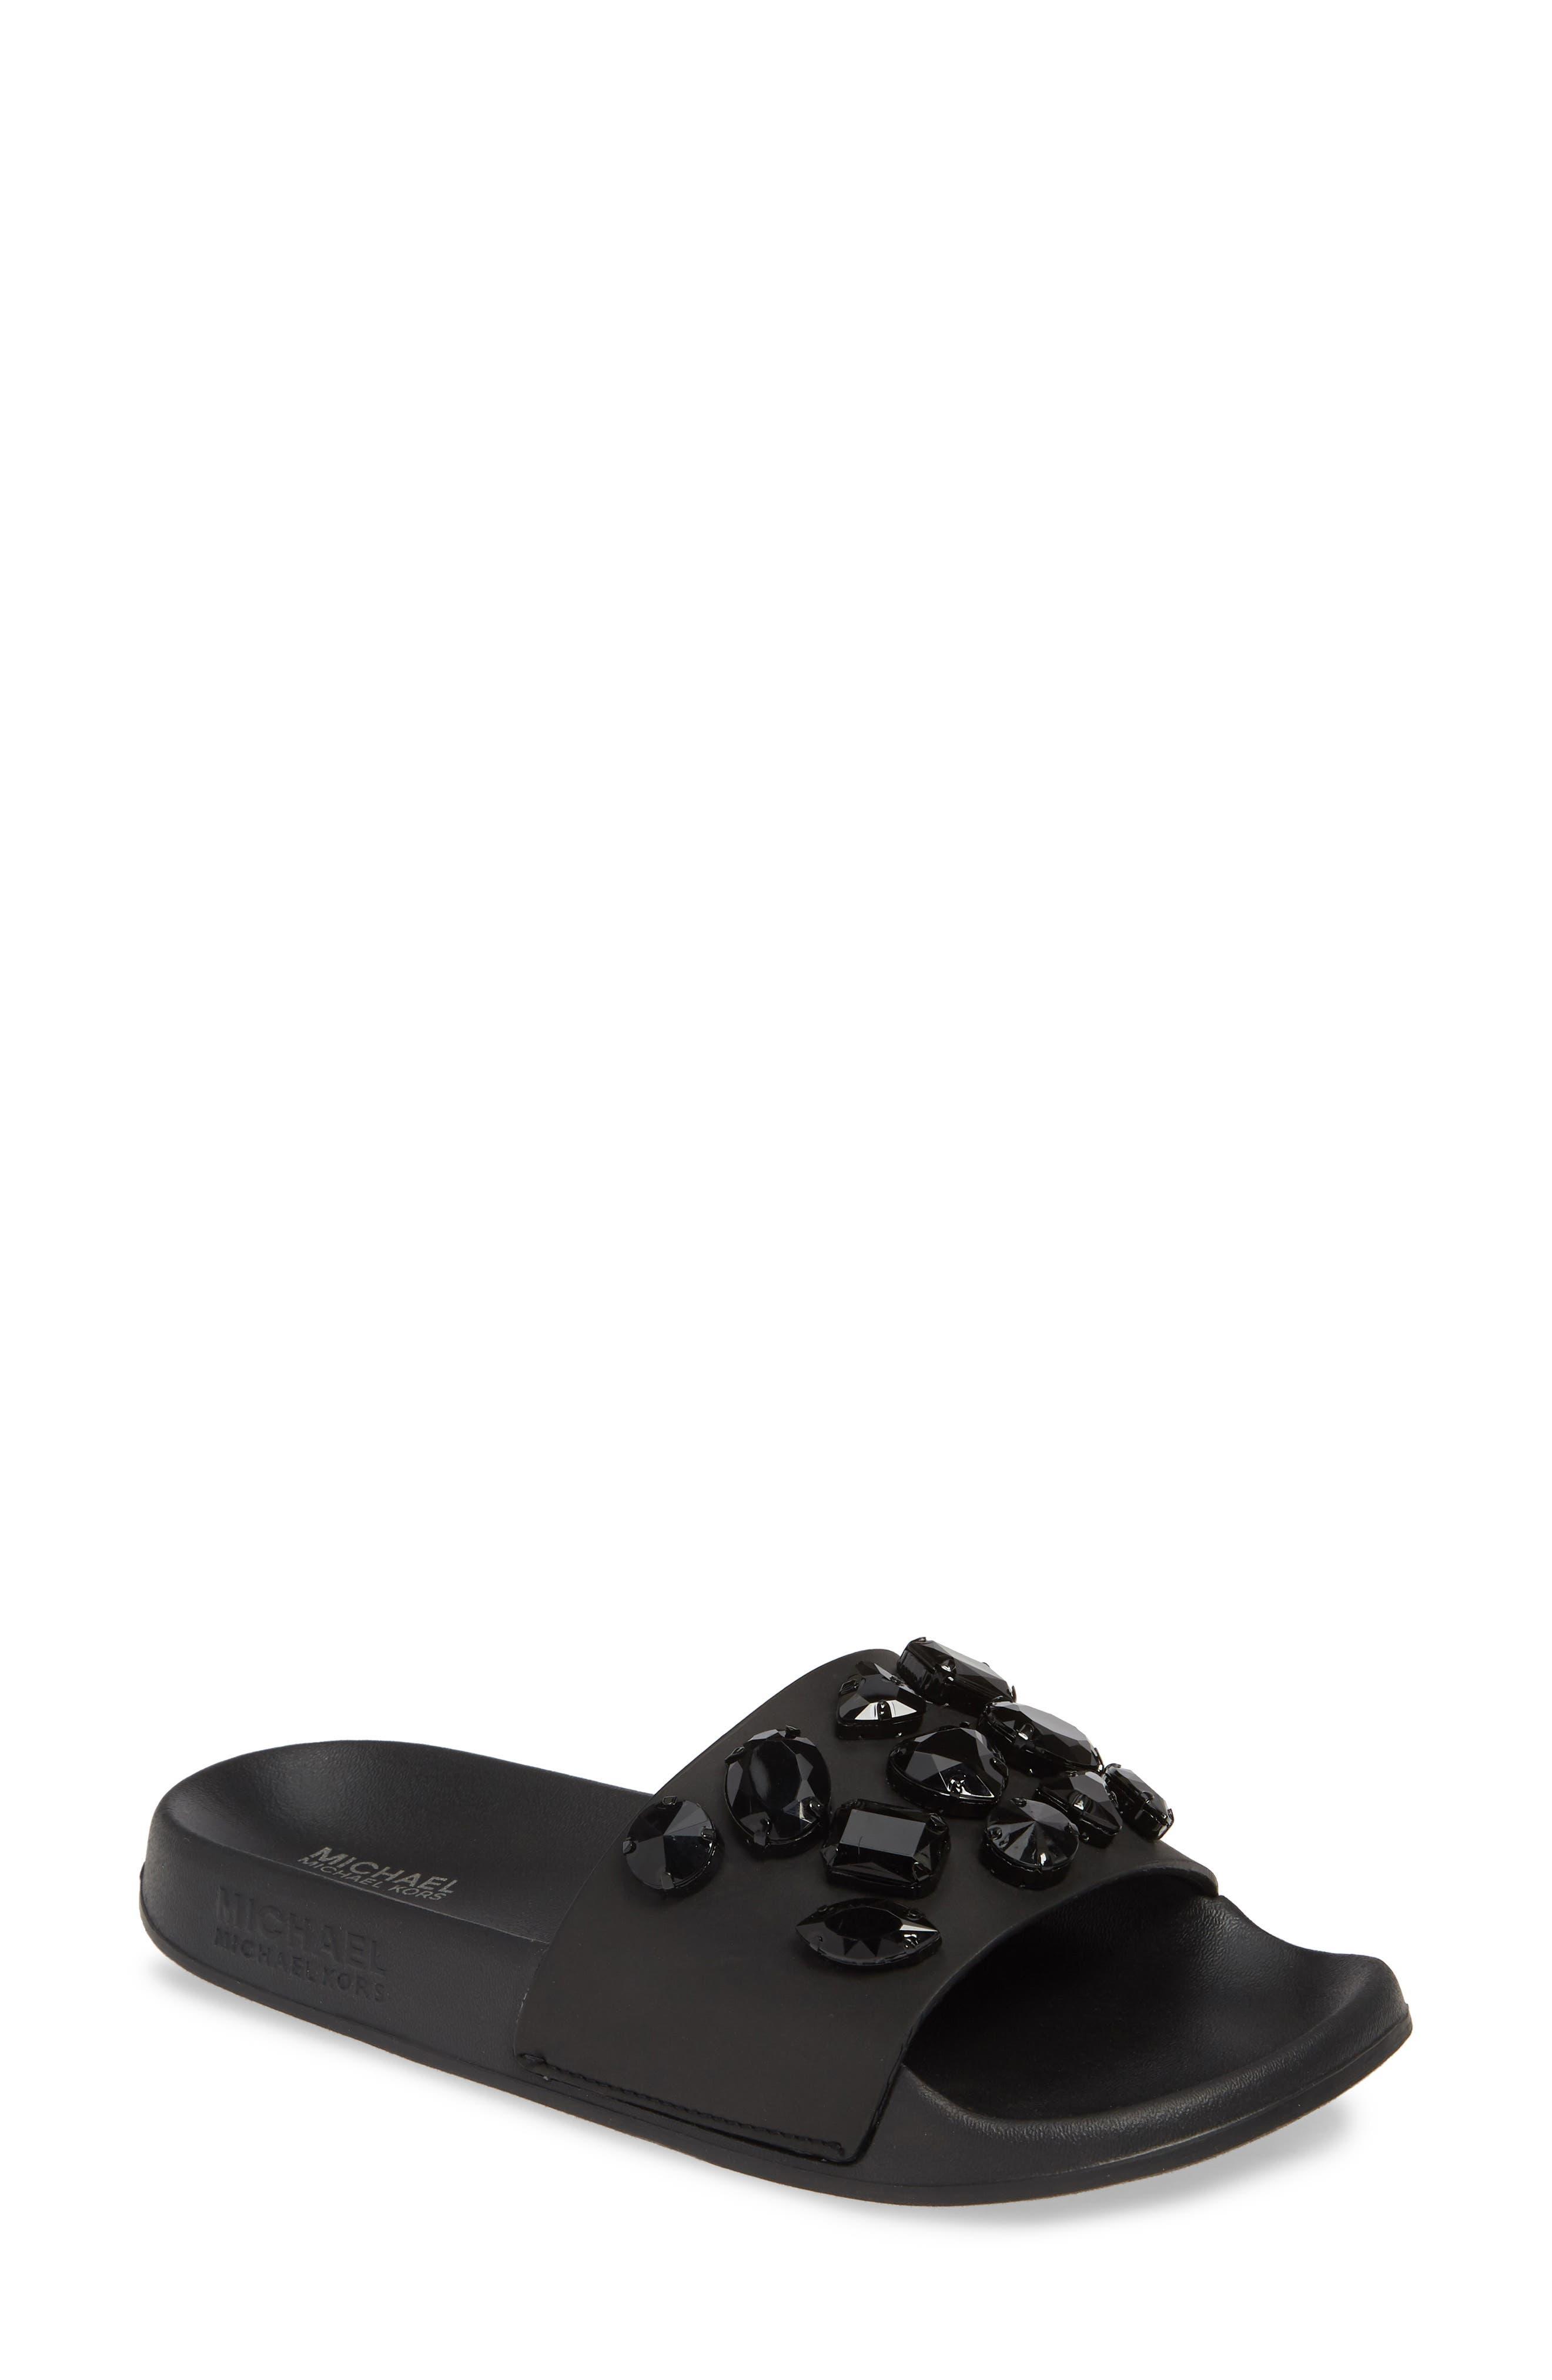 MICHAEL MICHAEL KORS Gilmore Slide Sandal, Main, color, BLACK